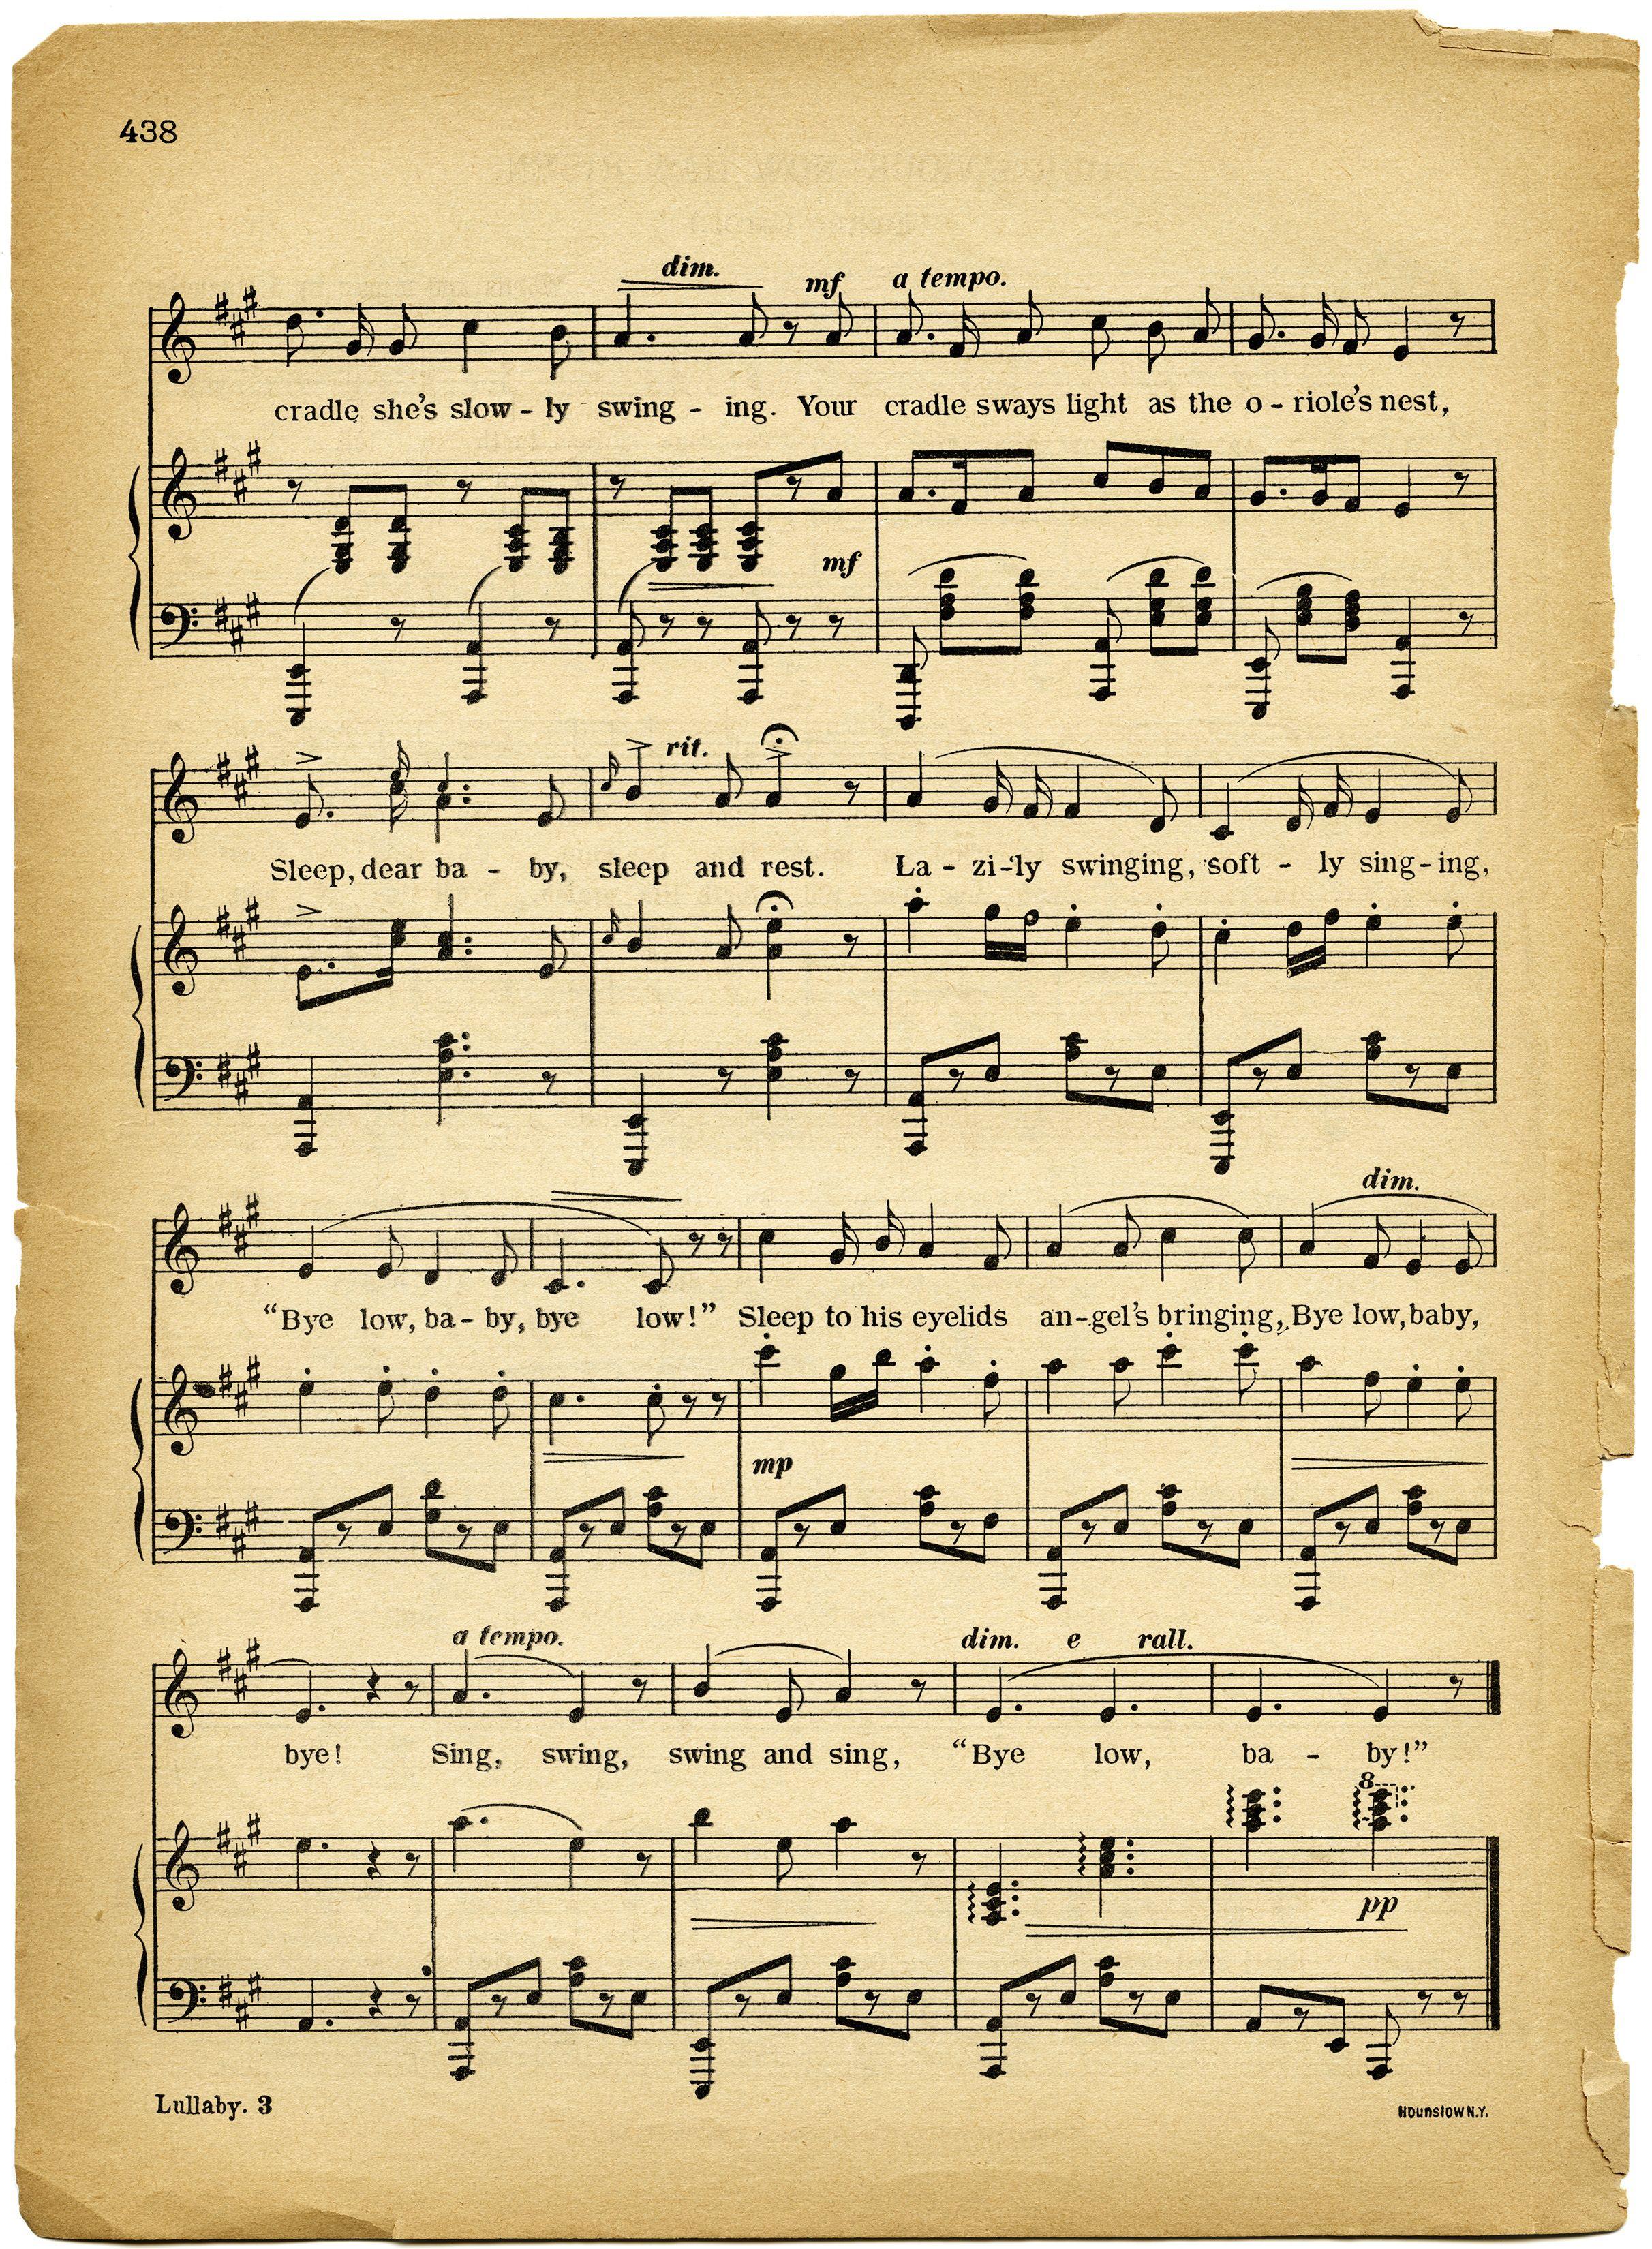 lullaby sheet music, vintage lullaby, margaret tuggle